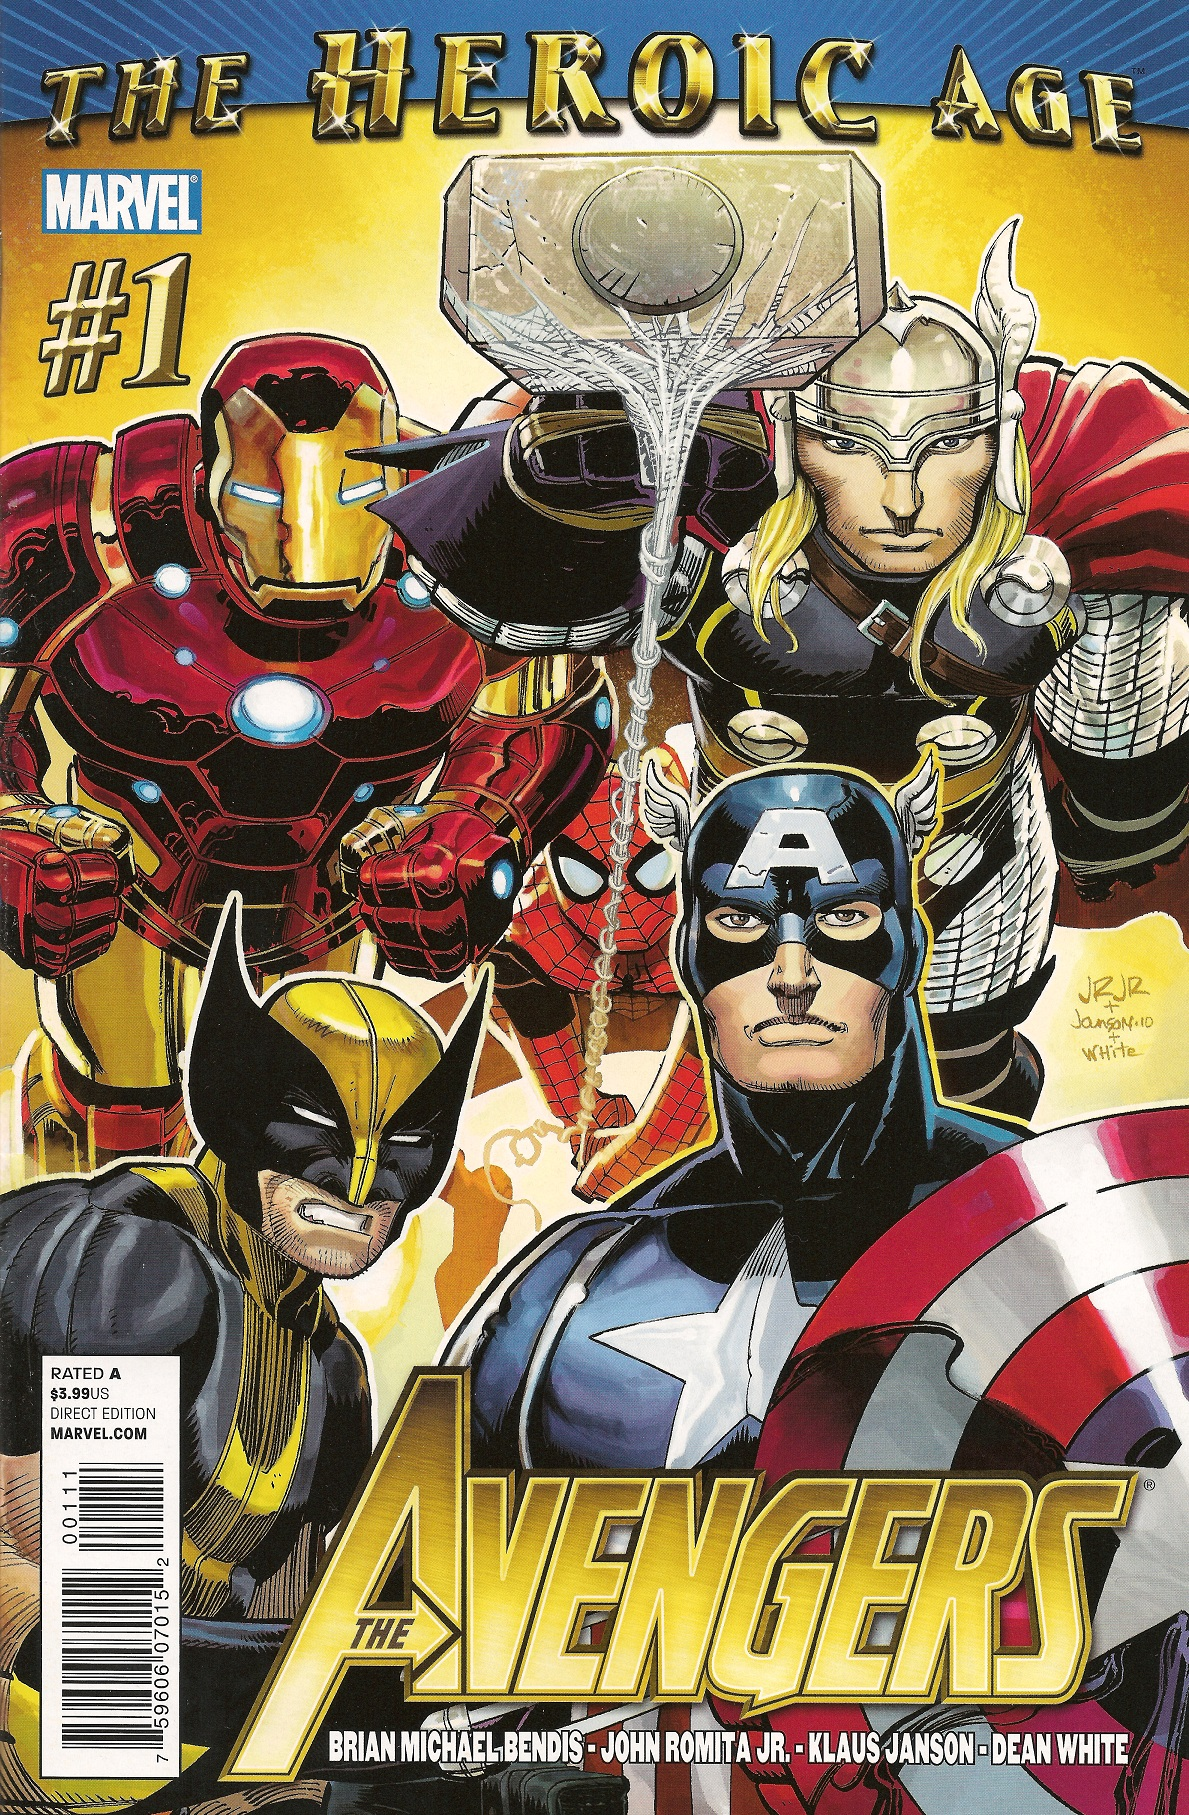 http://img3.wikia.nocookie.net/__cb20100520191720/marveldatabase/images/0/0b/Avengers_Vol_4_1.jpg